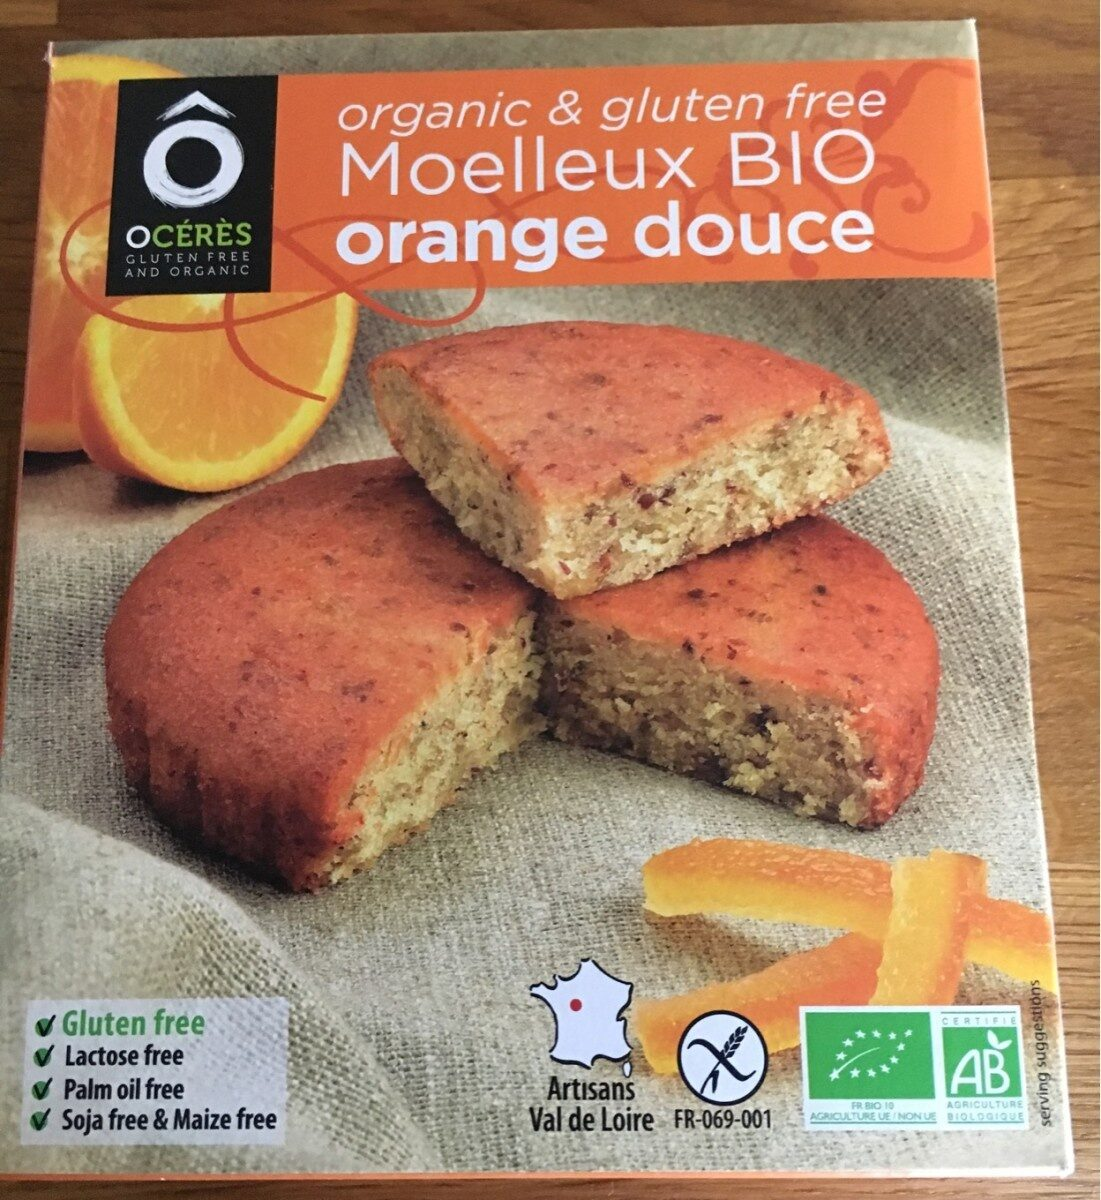 Moelleux Bio orange douce - Product